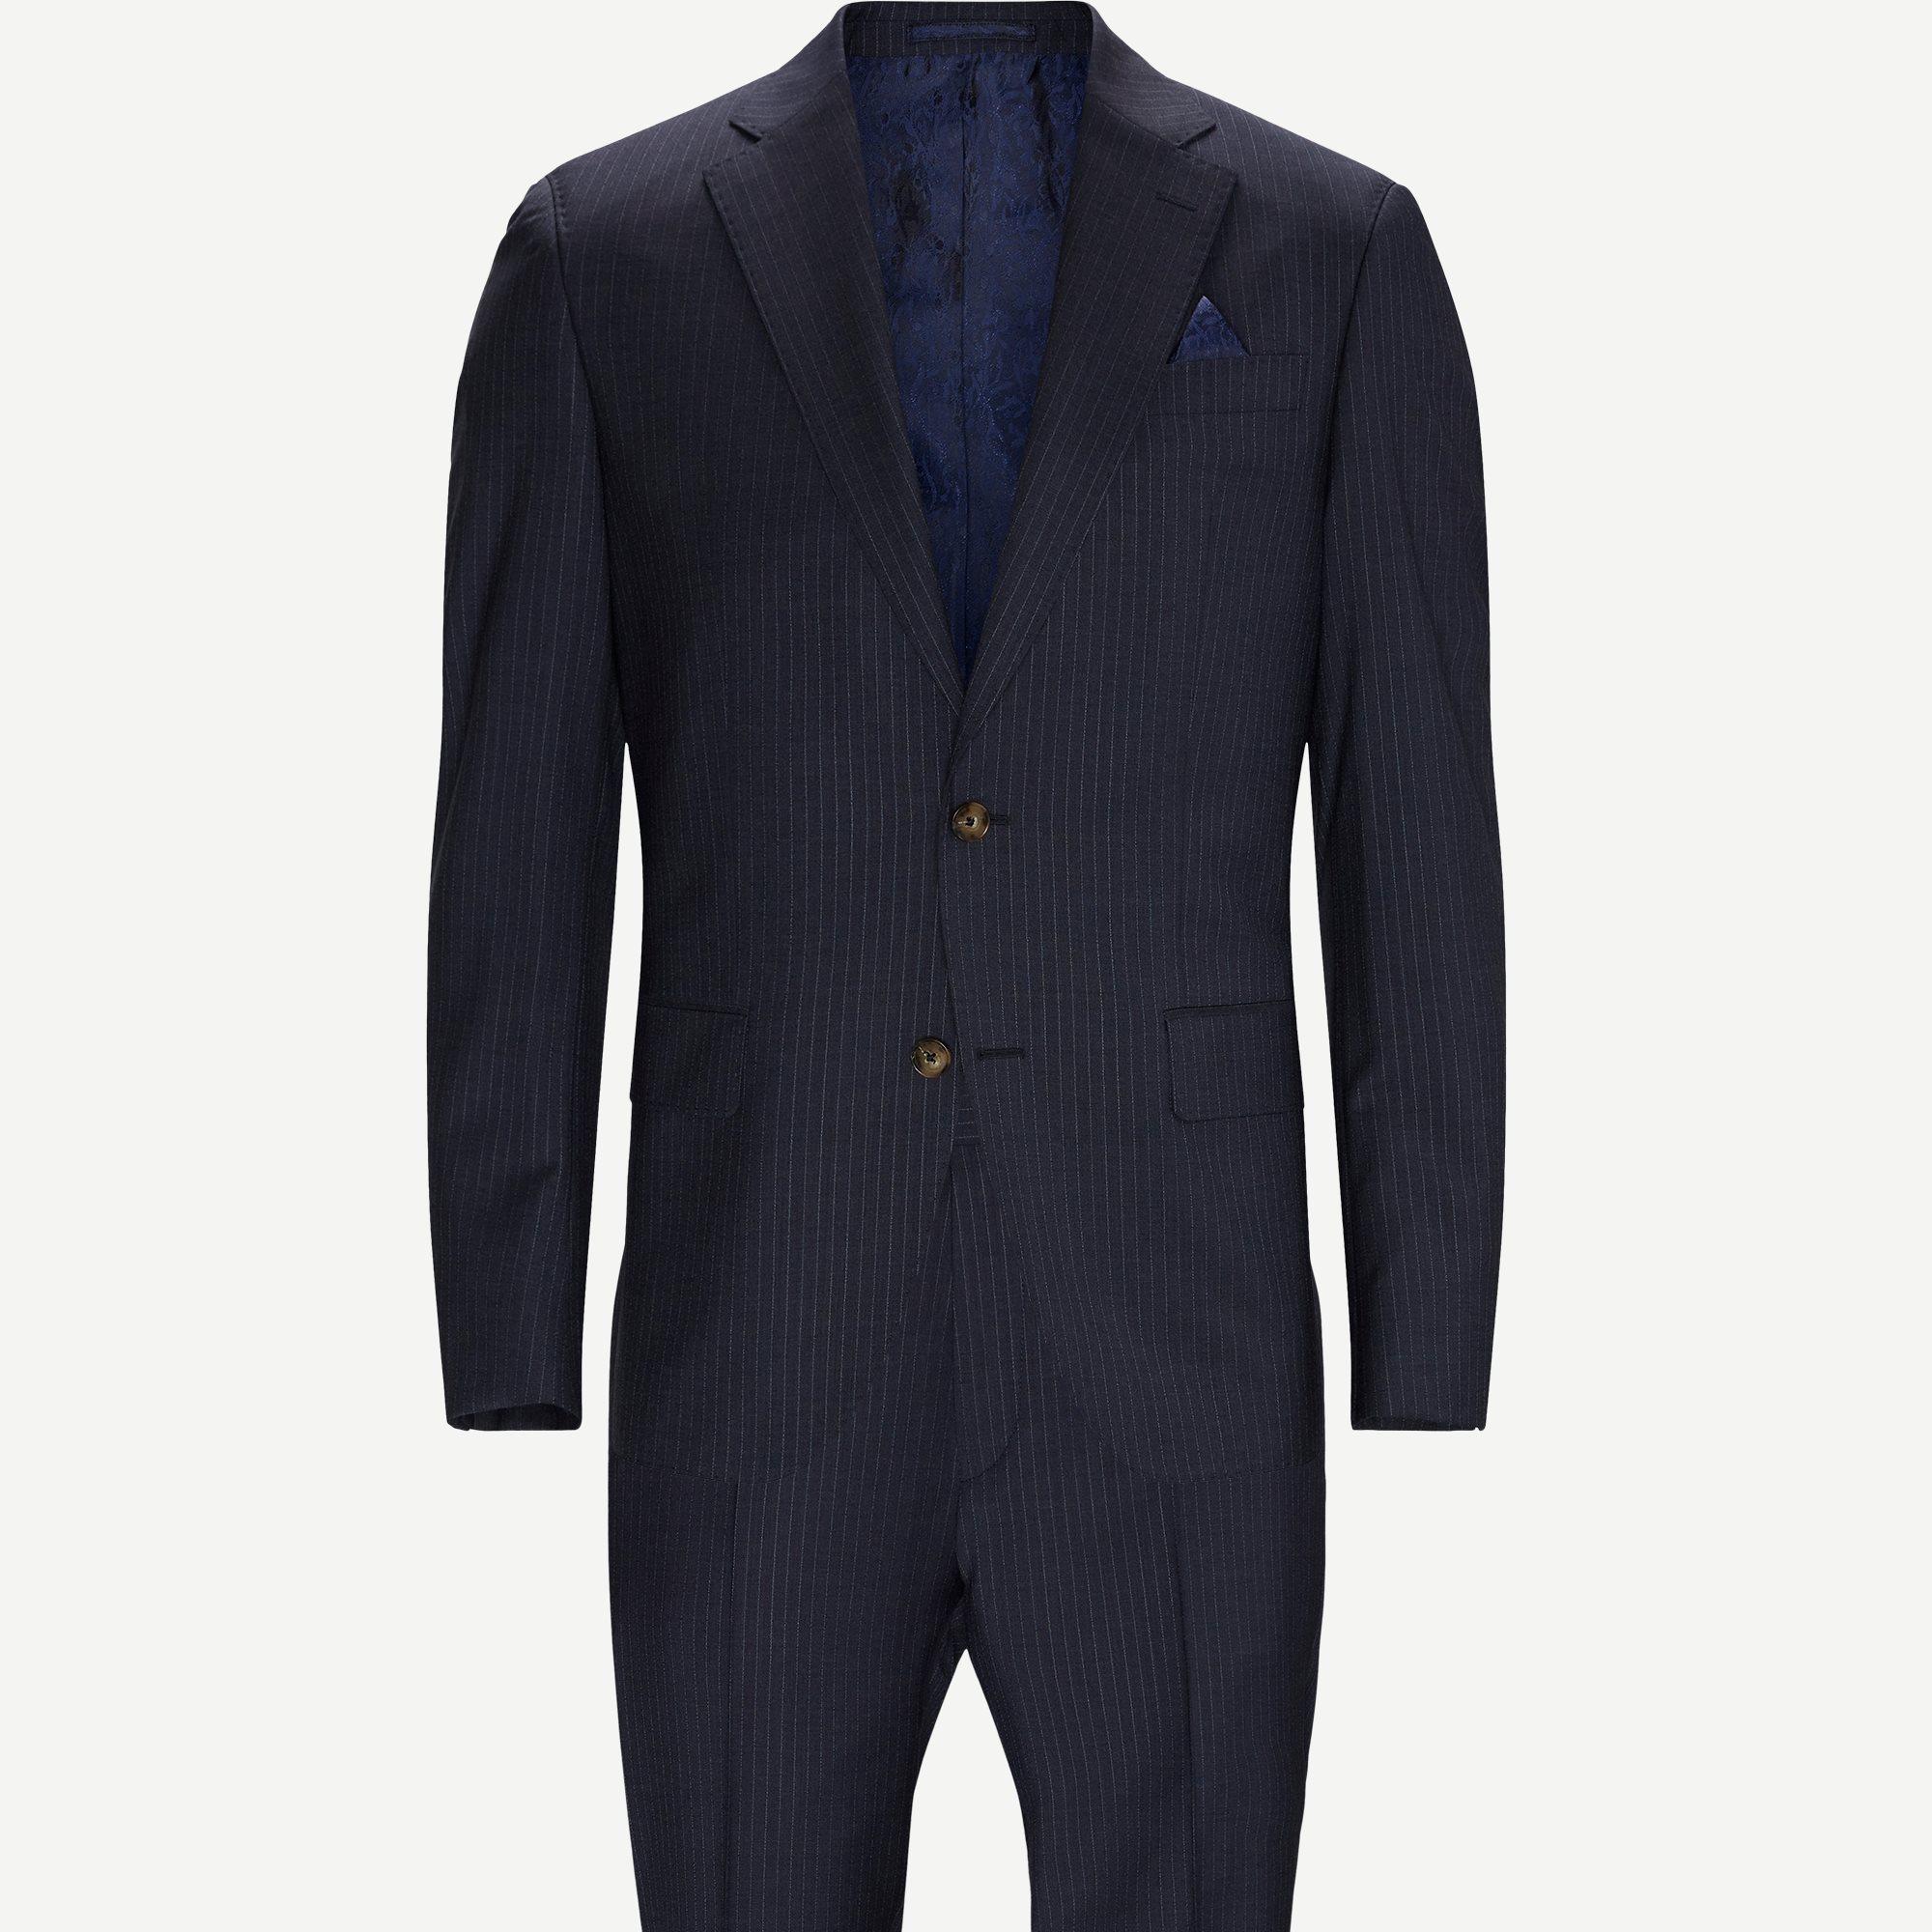 1825 Star Napoli Craig/Sherman Brandon Habit - Kostymer - Blå